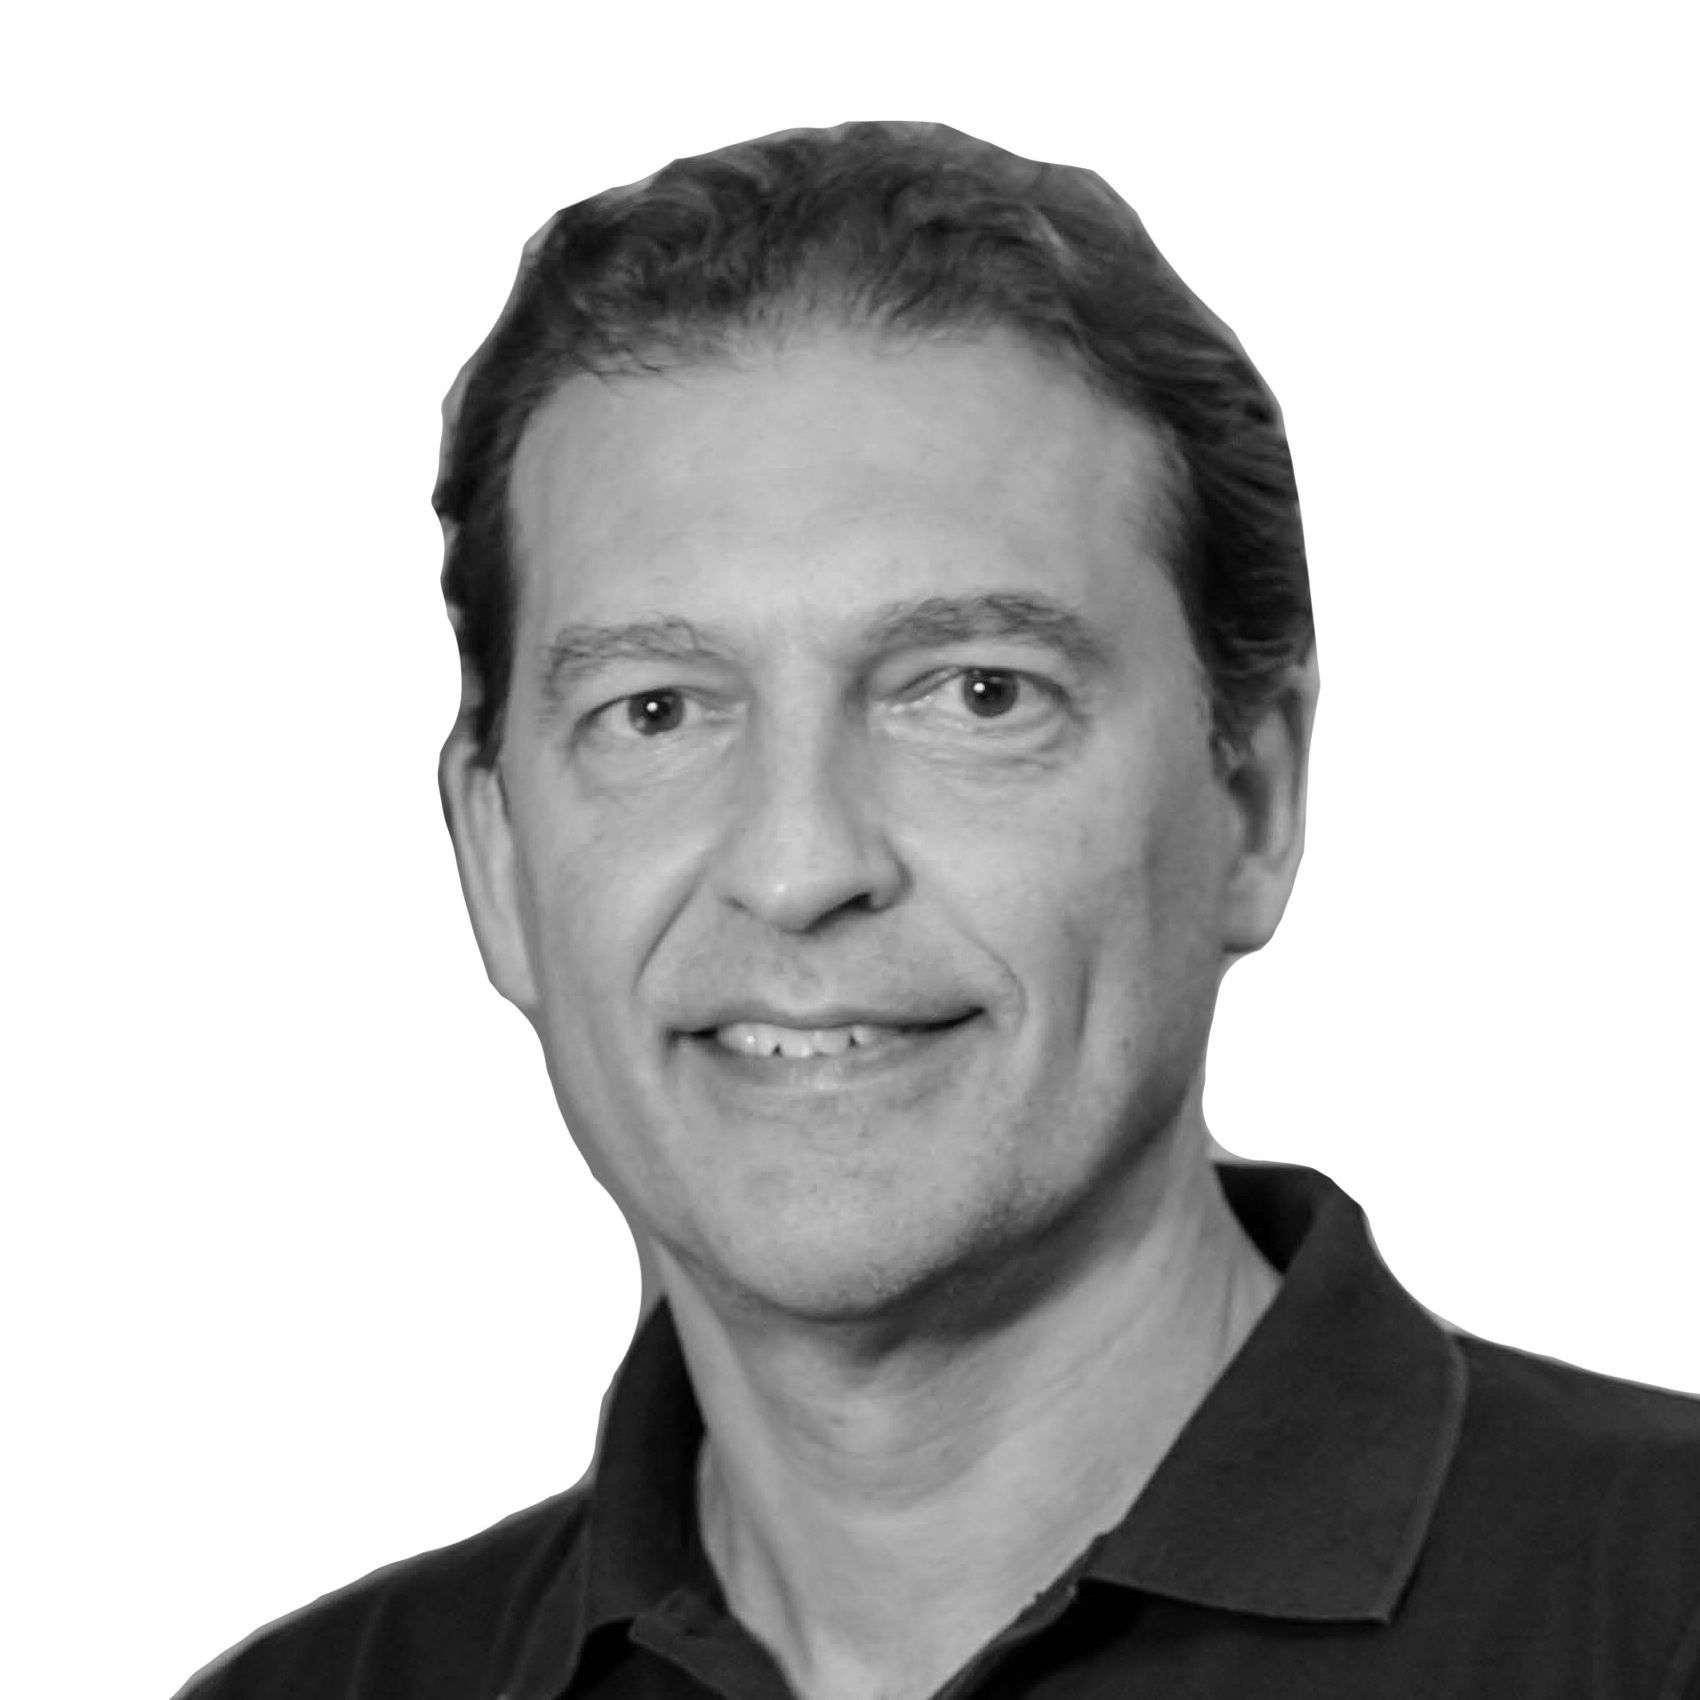 Francisco Fortes | Organisational Culture transformation